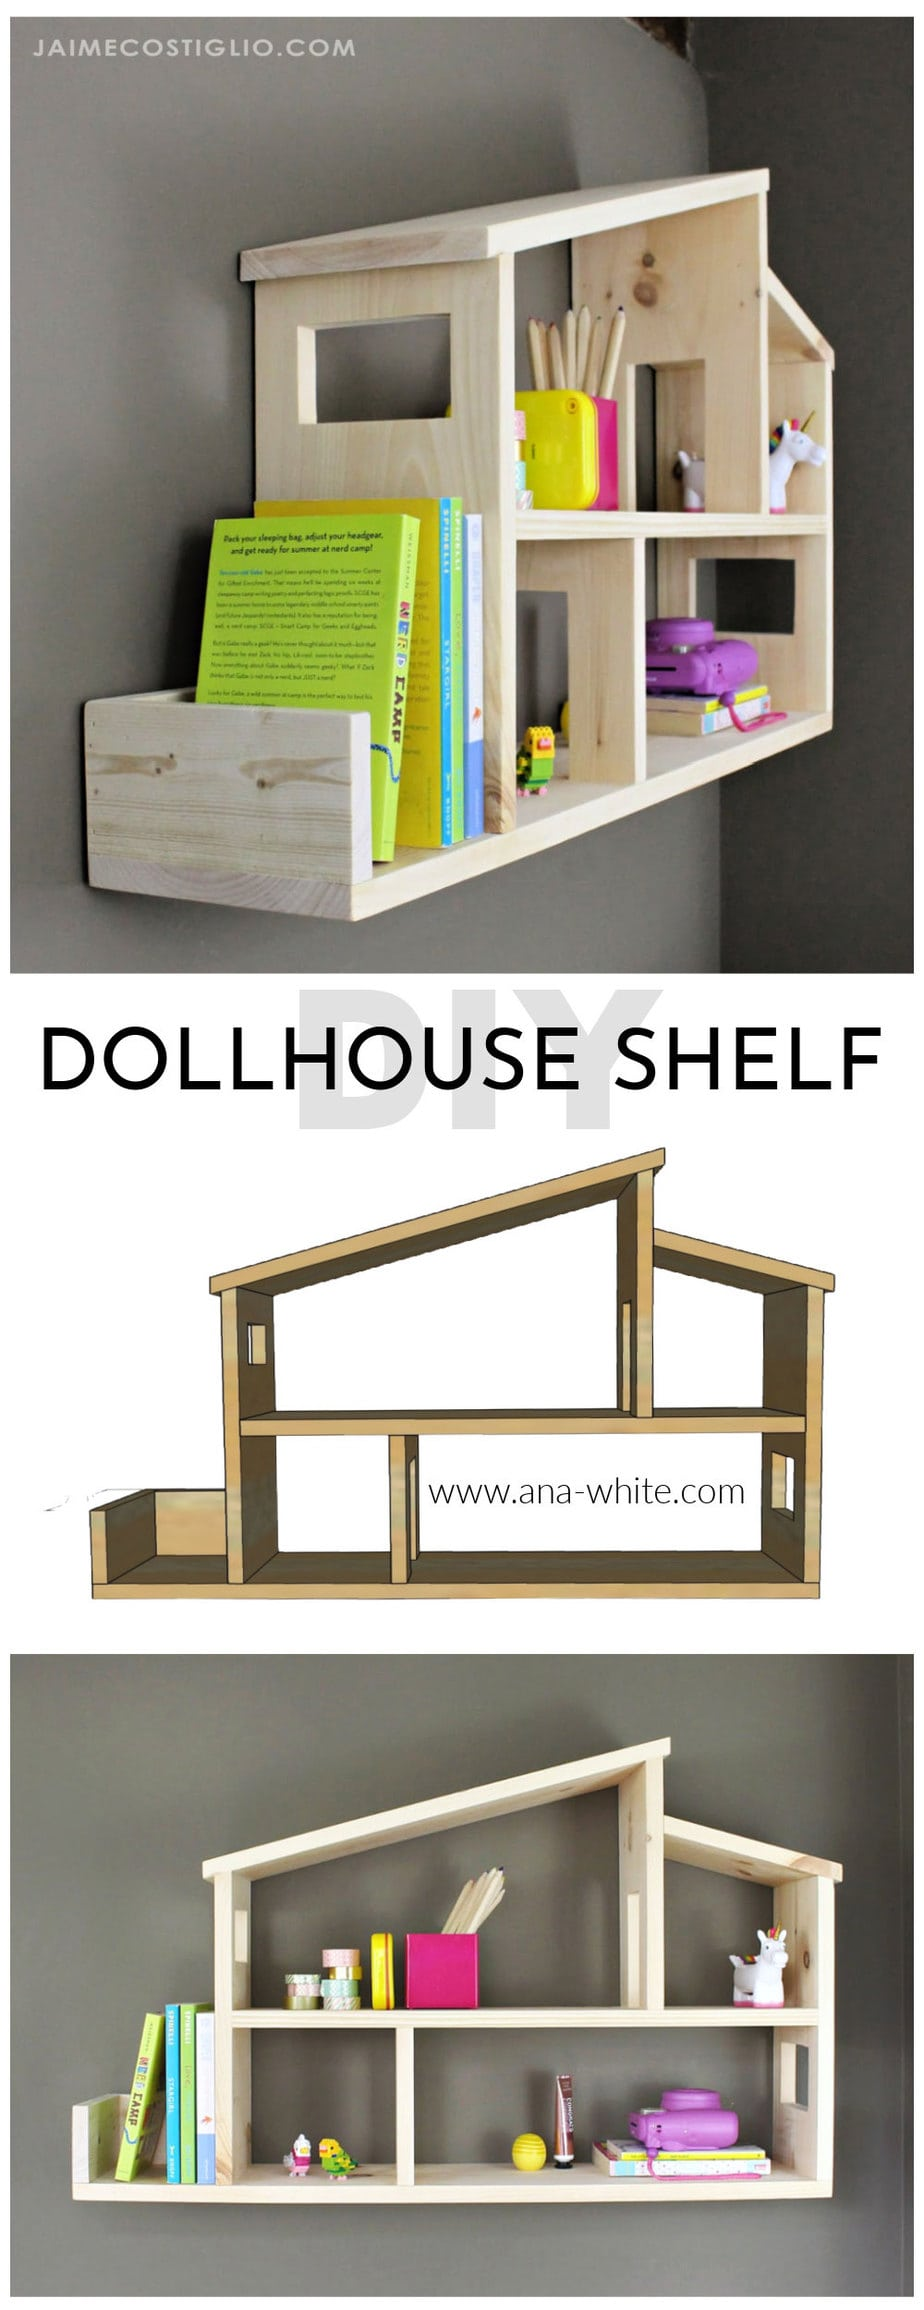 dollhouse shelf plans